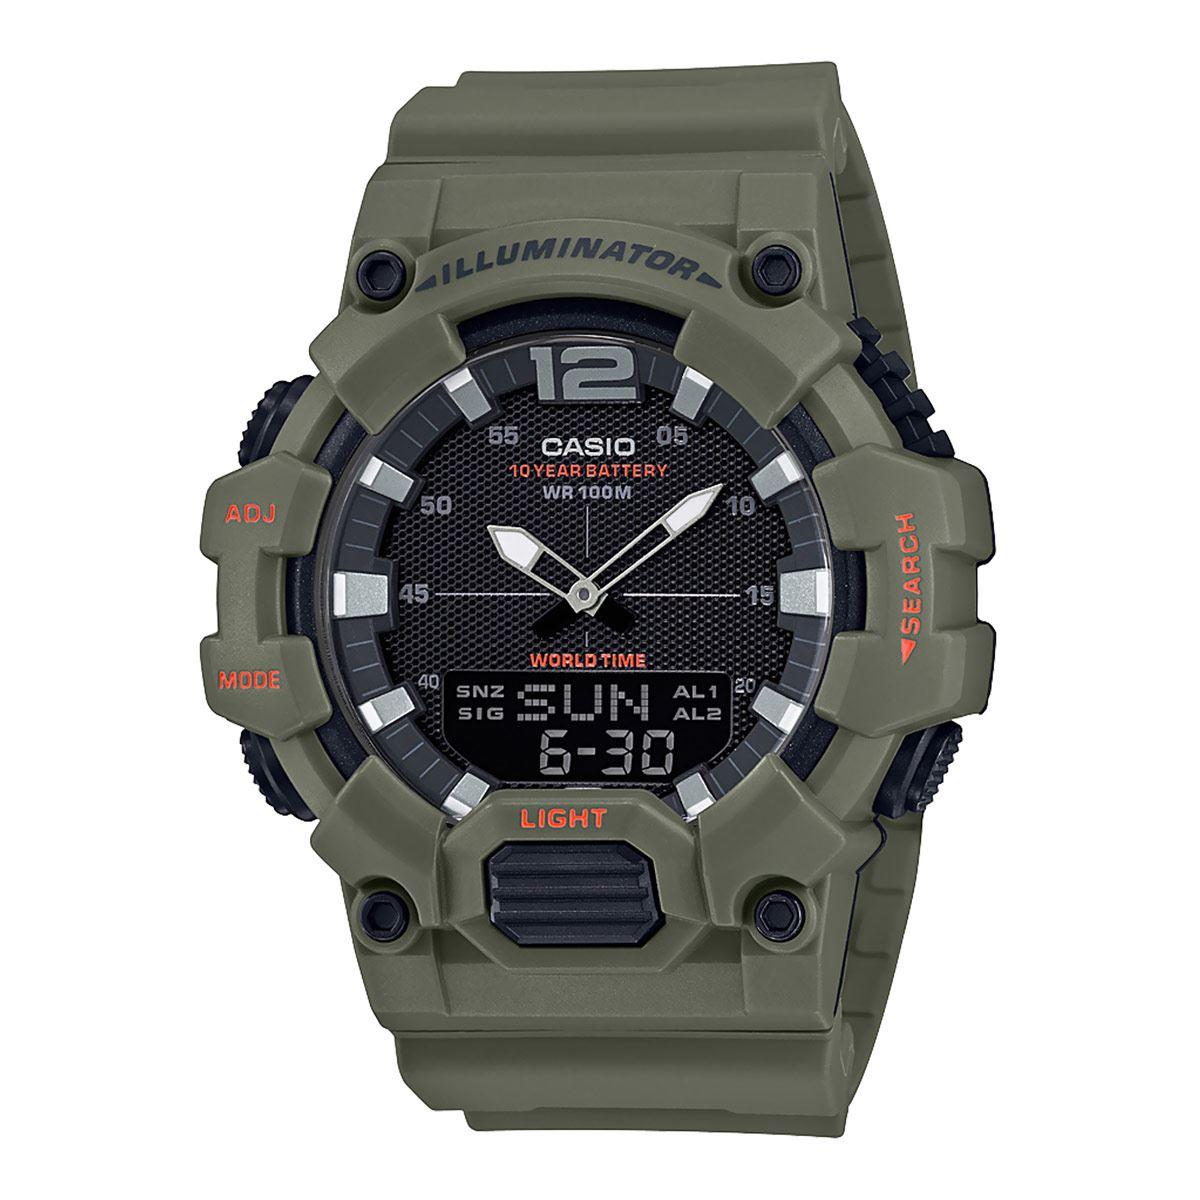 Reloj Casio HDC-700-3A2VCF Para Caballero